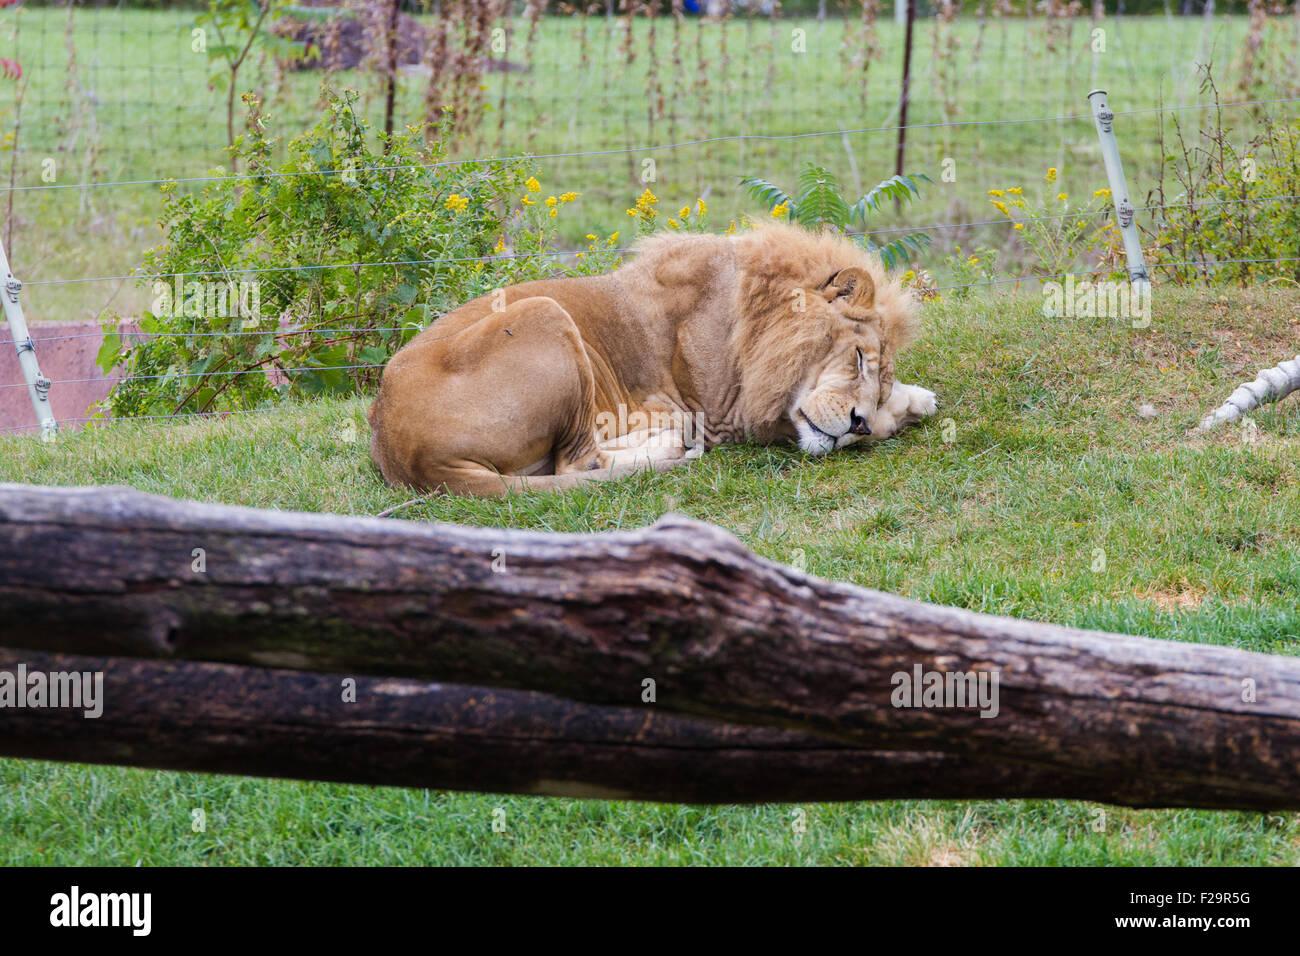 Lion sleeping inside cage Toronto zoo - Stock Image